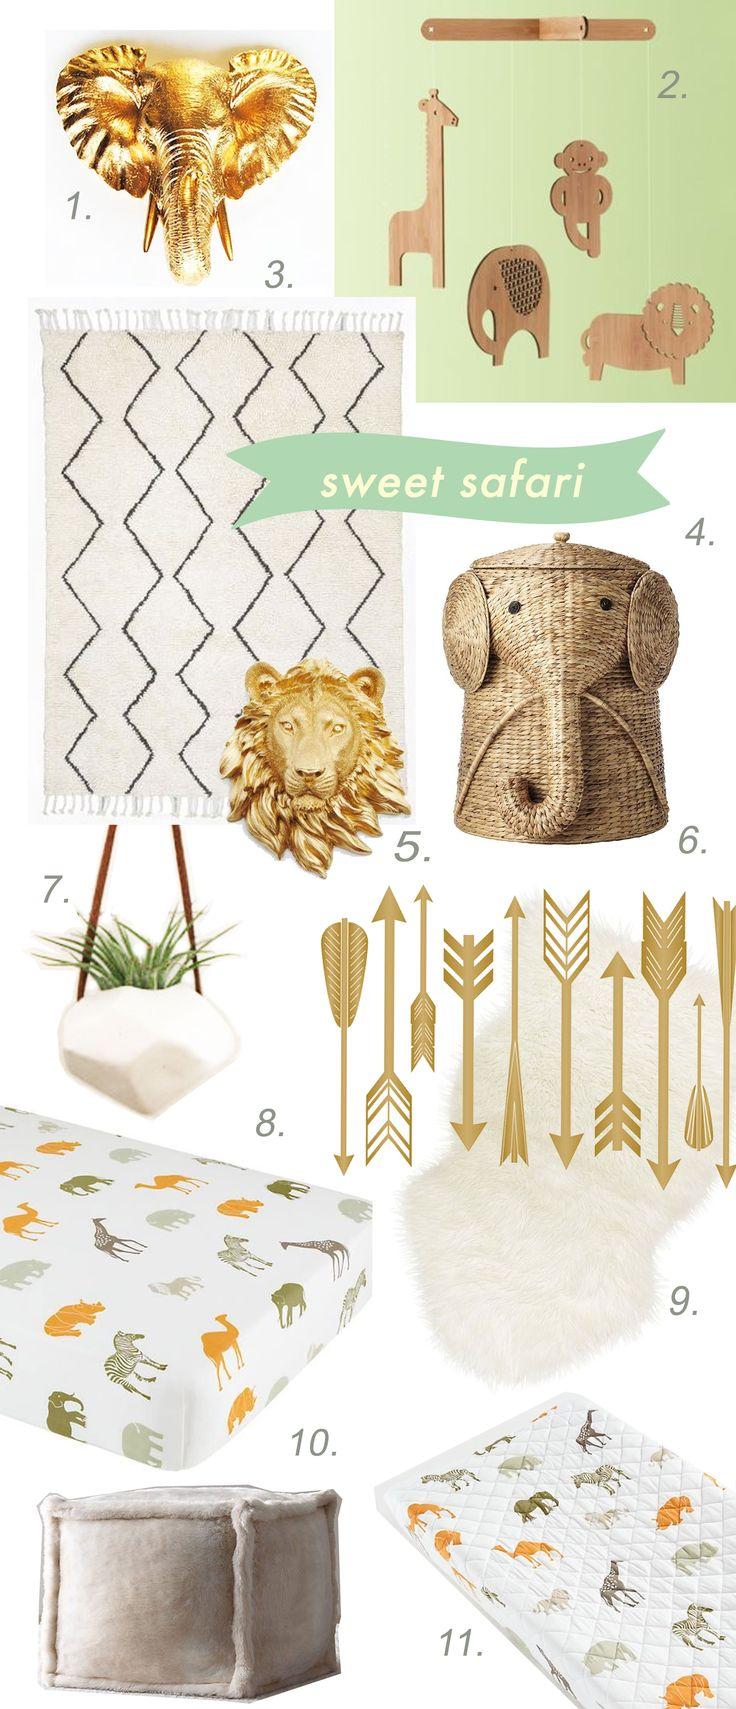 best  safari nursery ideas on pinterest  safari room safari  - sweet safari nursery theme  by chachi loves design